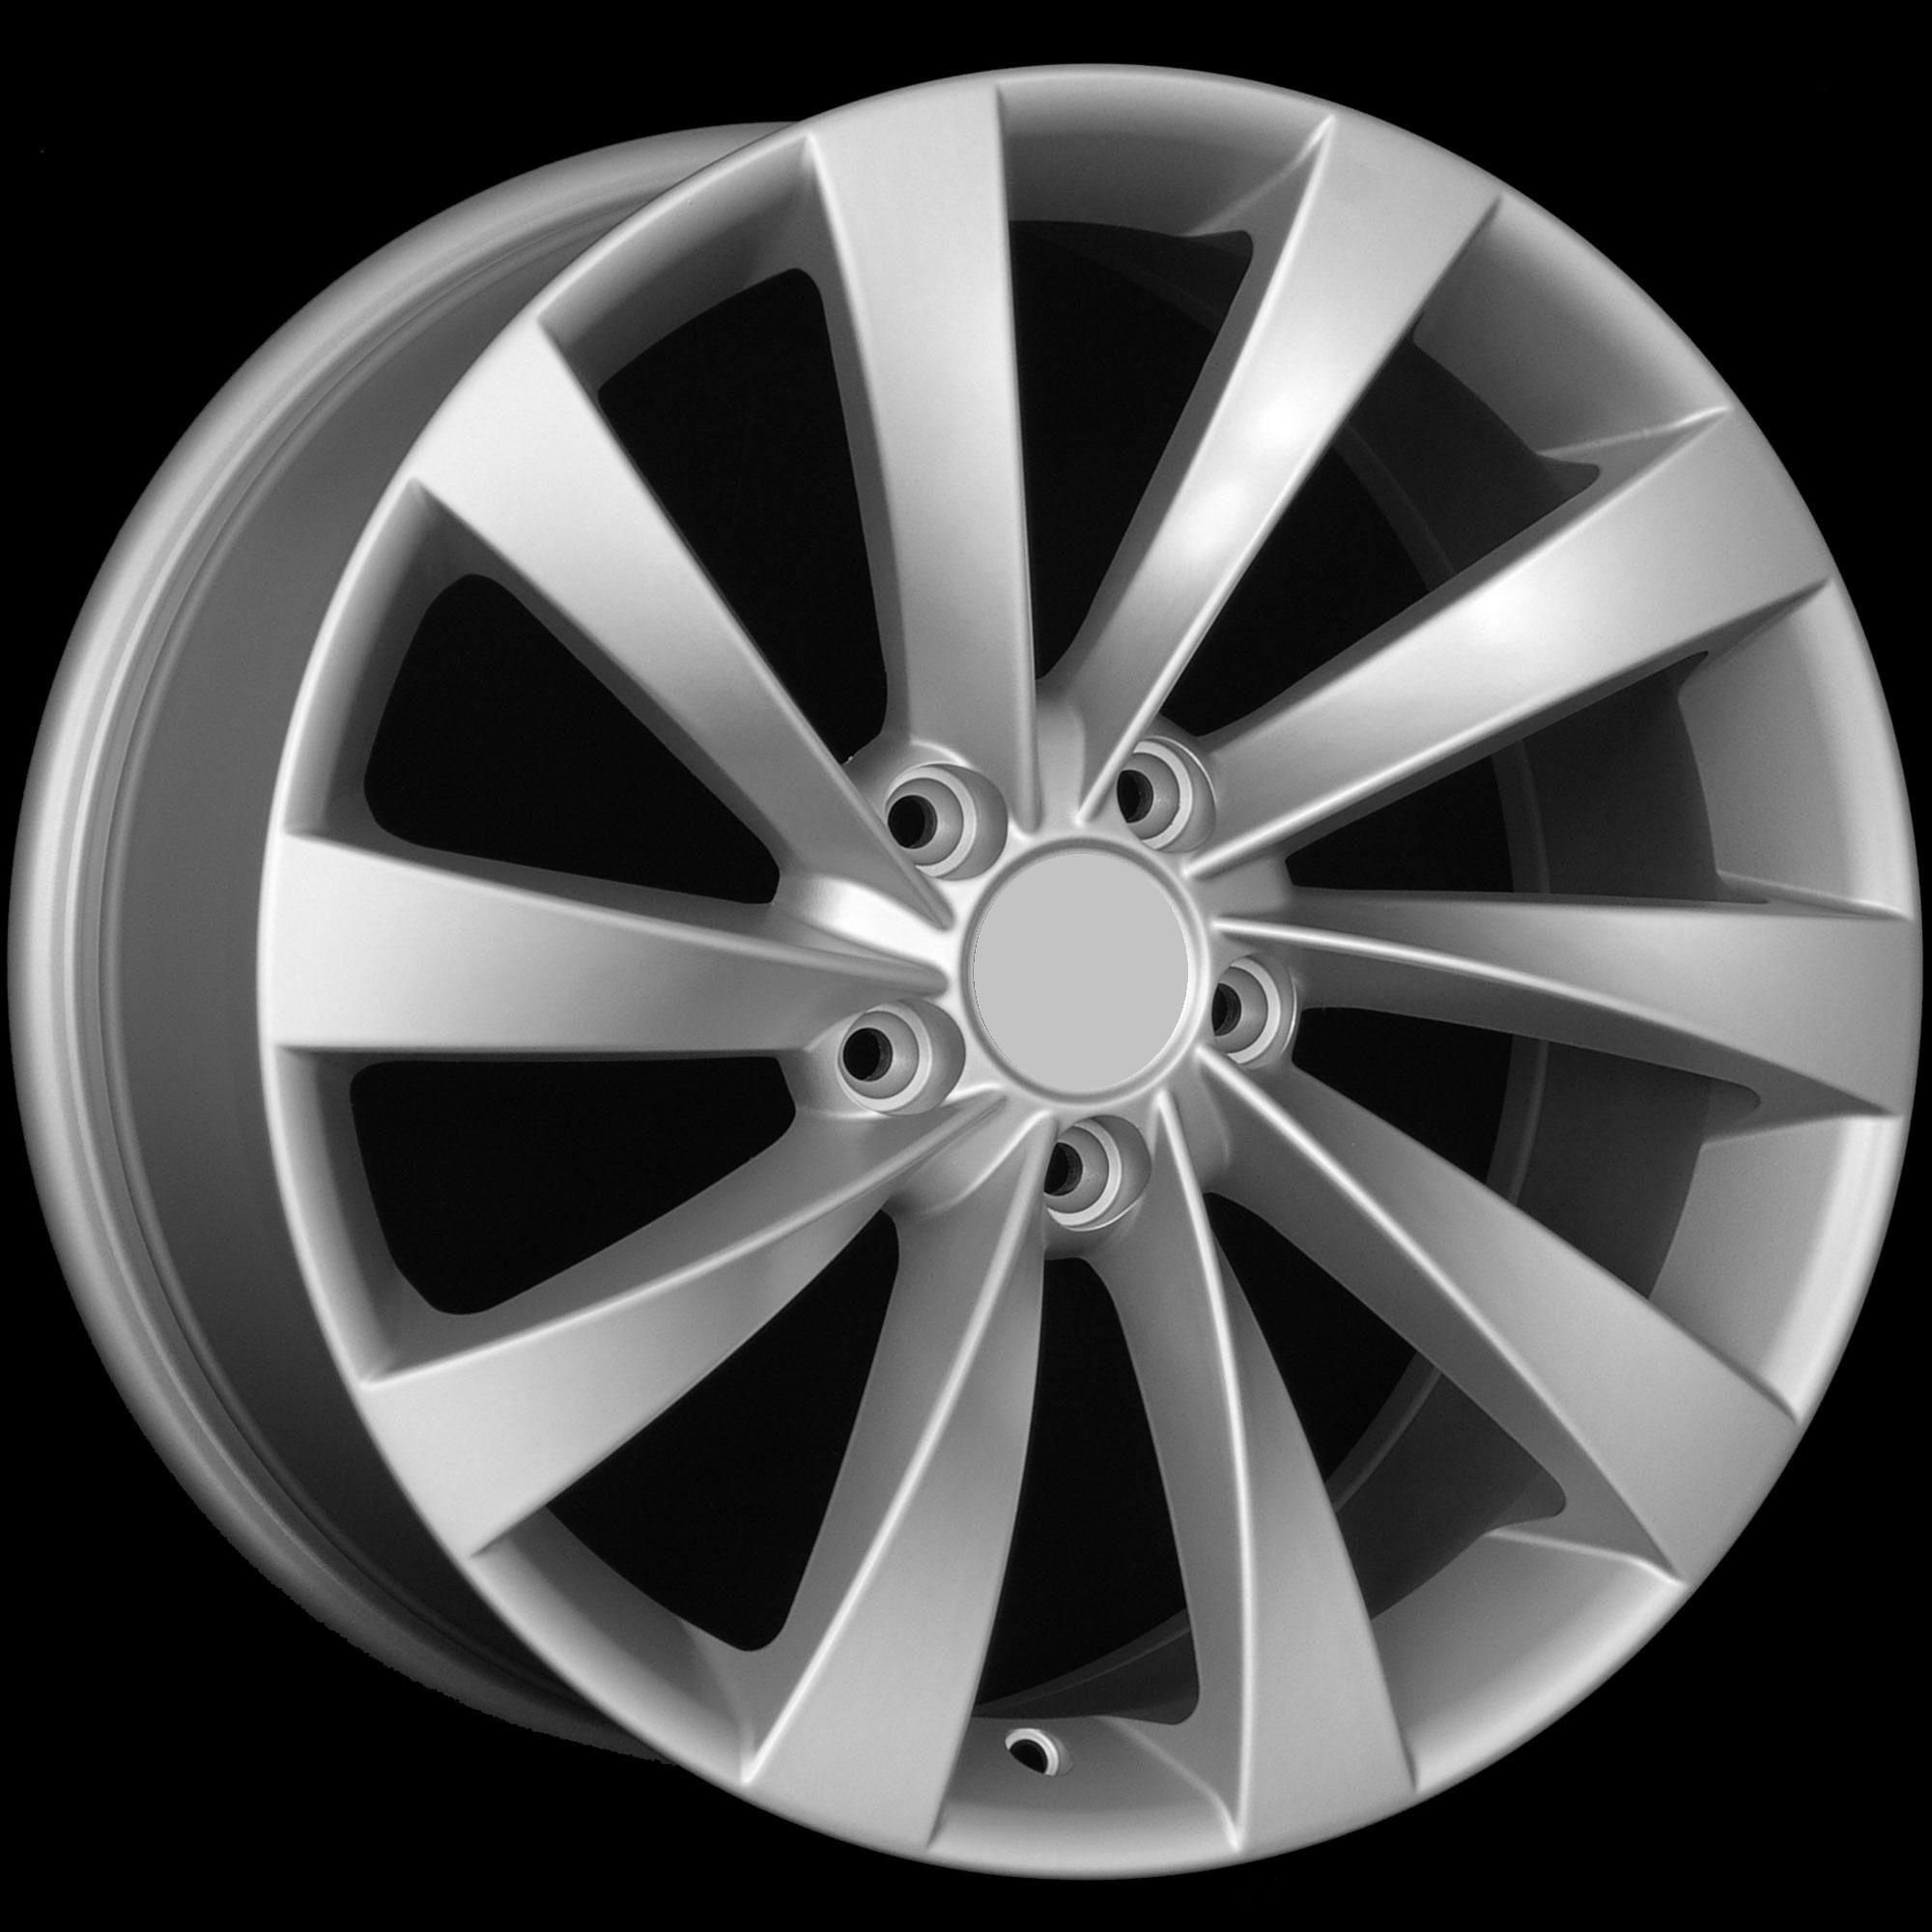 18 VW Turbine Style Matte Silver Wheels Rims Fit VW Golf Rabbit GTI